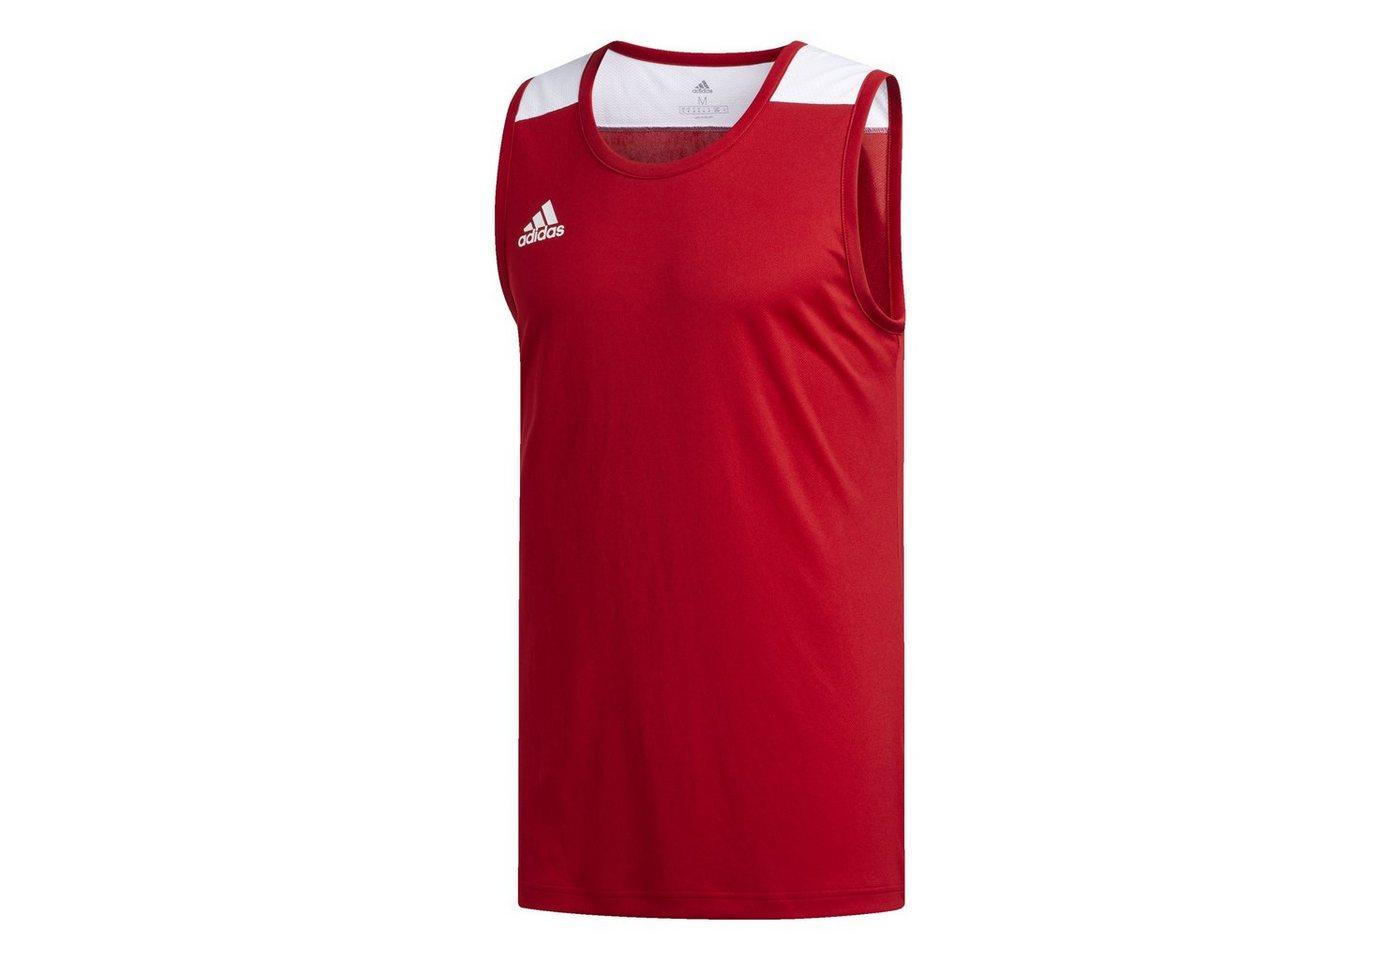 adidas Performance Basketballtrikot »Creator 365 Jersey« | Sportbekleidung > Trikots > Basketballtrikots | Rot | Polyester | adidas Performance